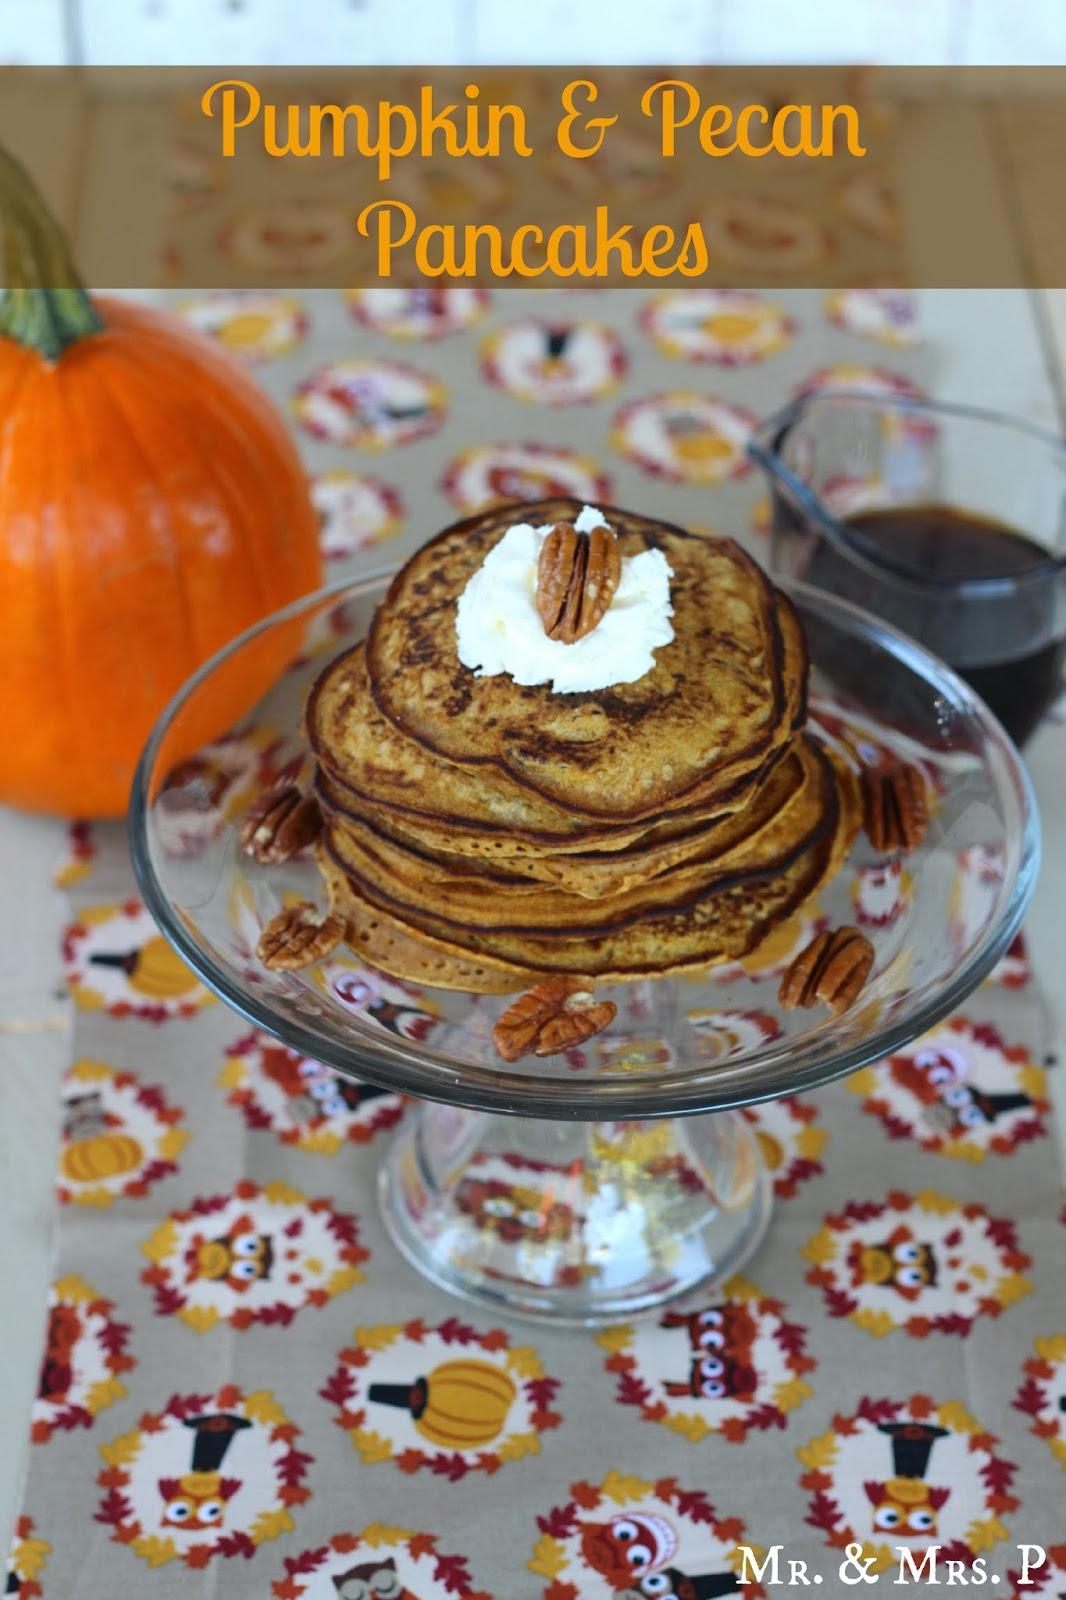 Mr. & Mrs. P: Pumpkin and Pecan Pancakes